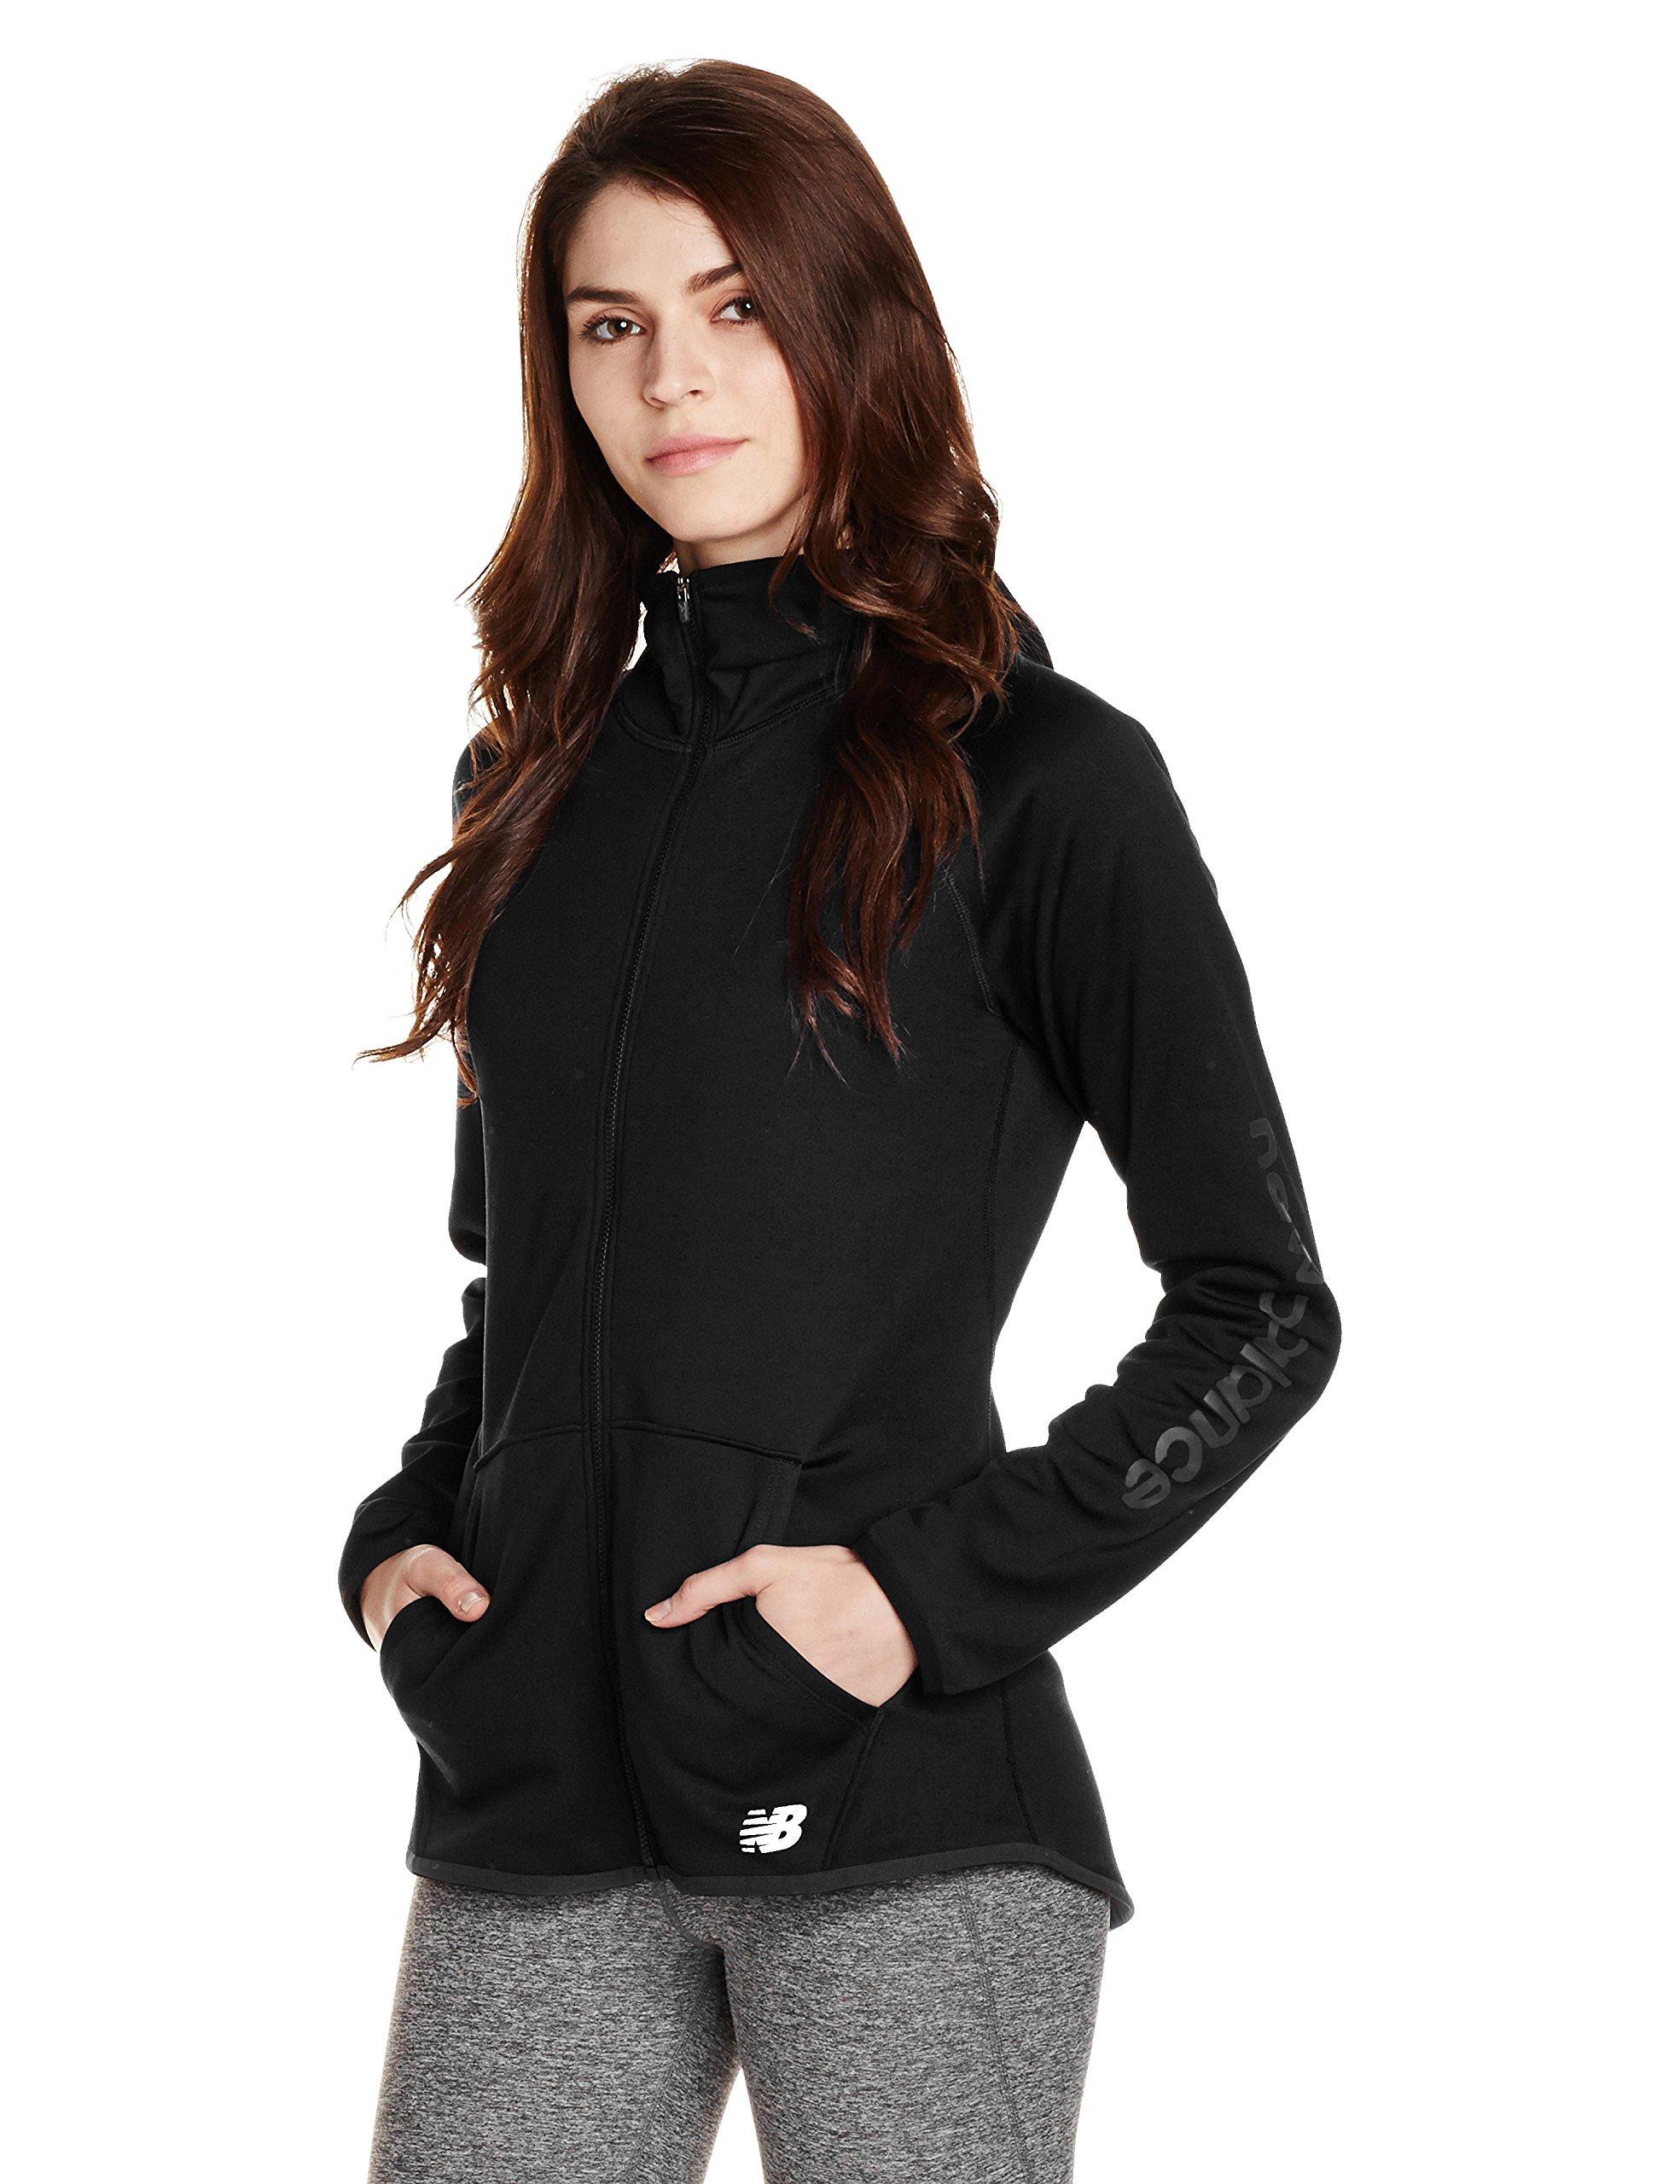 New Balance Womens Nb Core Fleece Full Zip, Black, X-Small